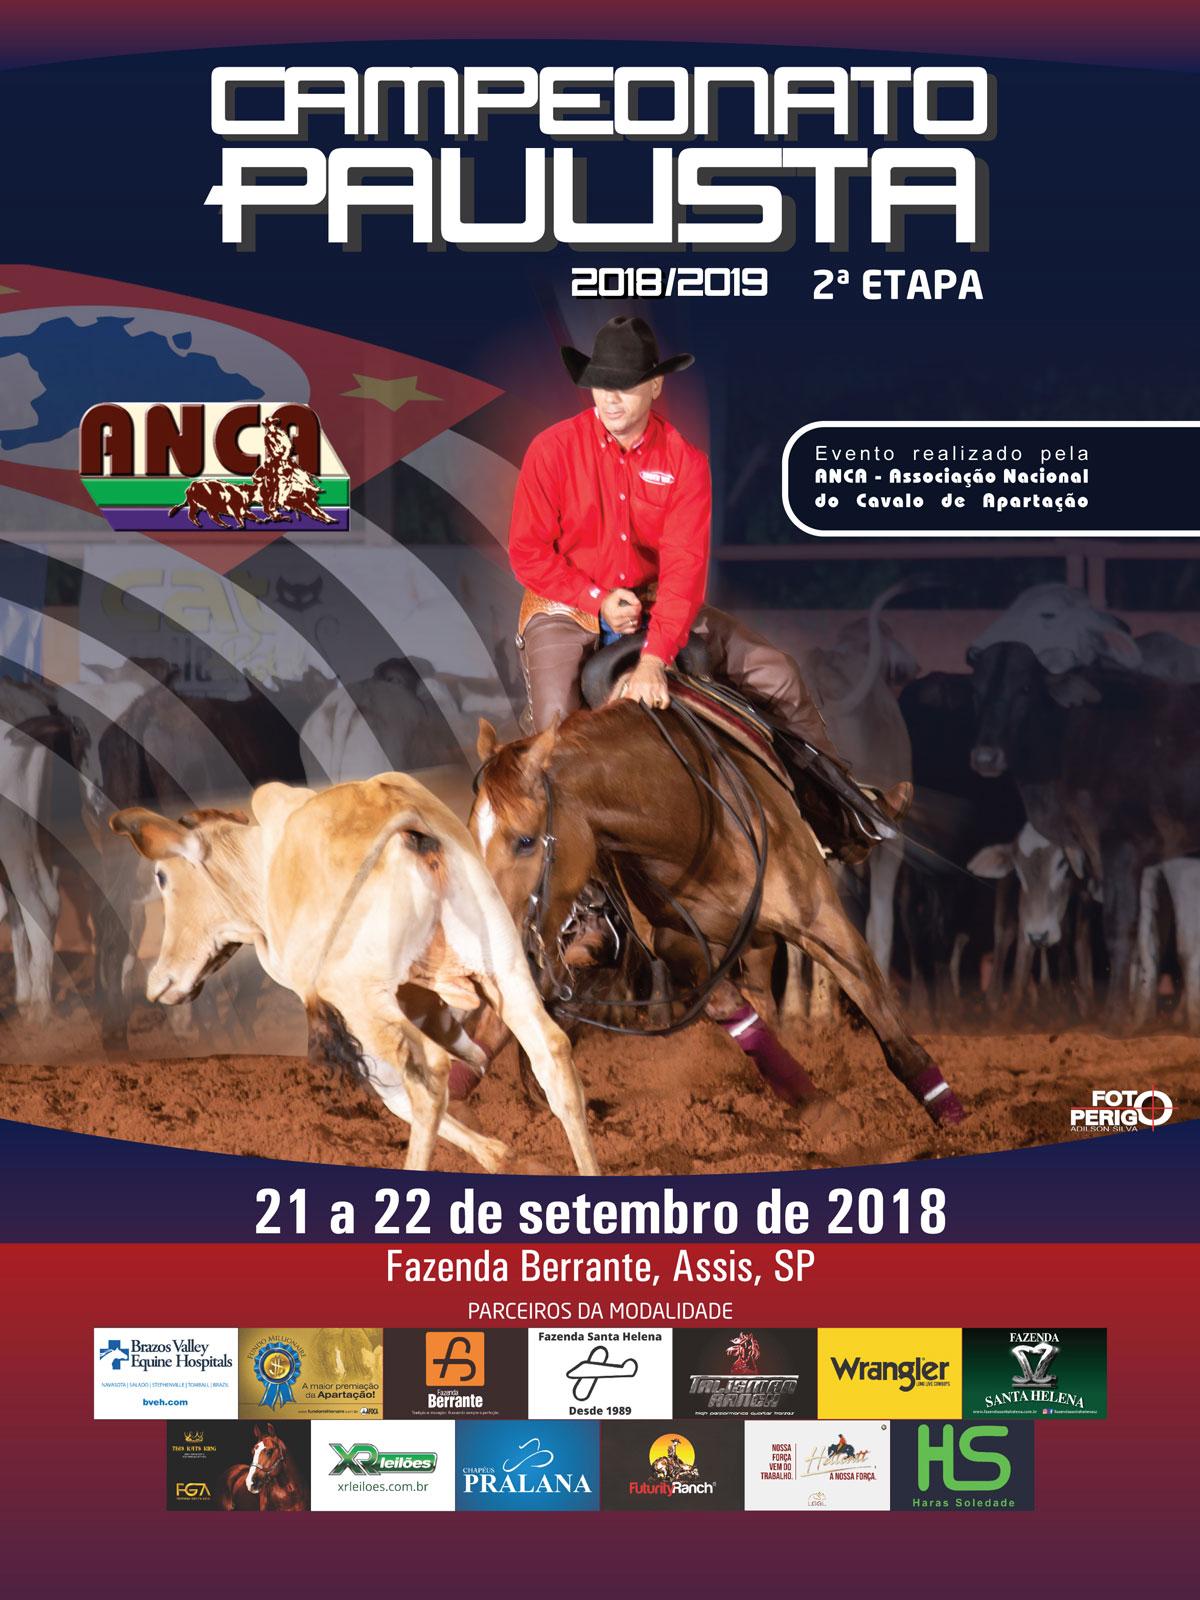 Campeonato Paulista ANCA 2018/2019 - 2ª Etapa